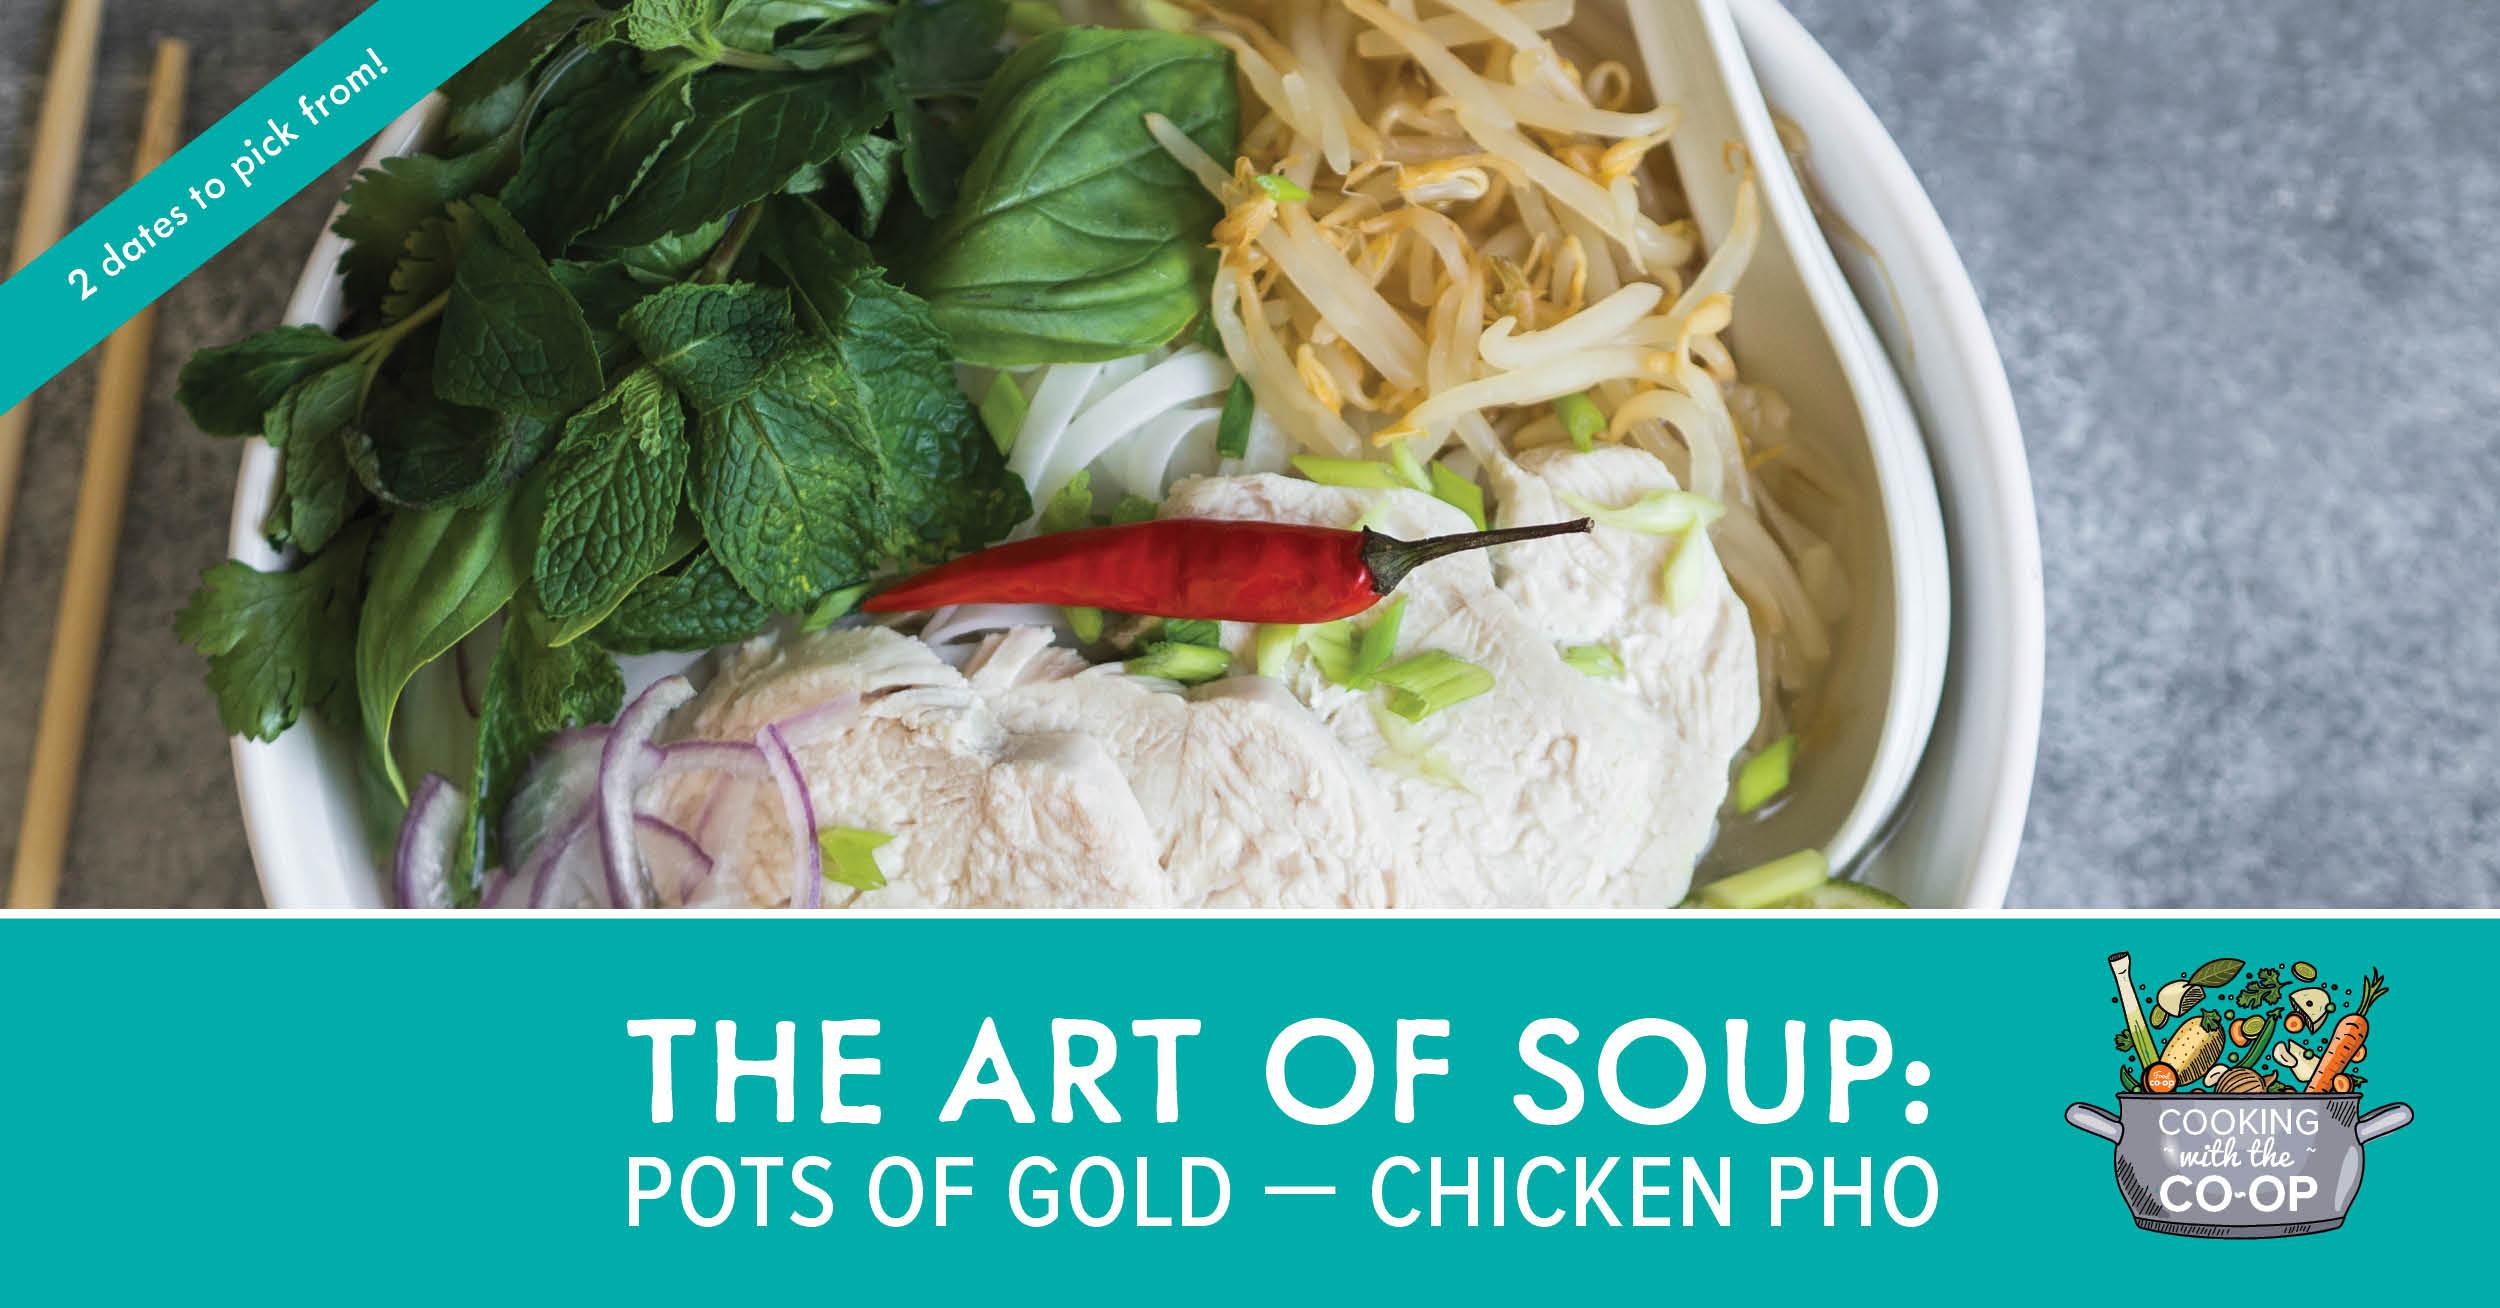 The Art of Soup Pots of Gold Apr 2019_FB.jpg